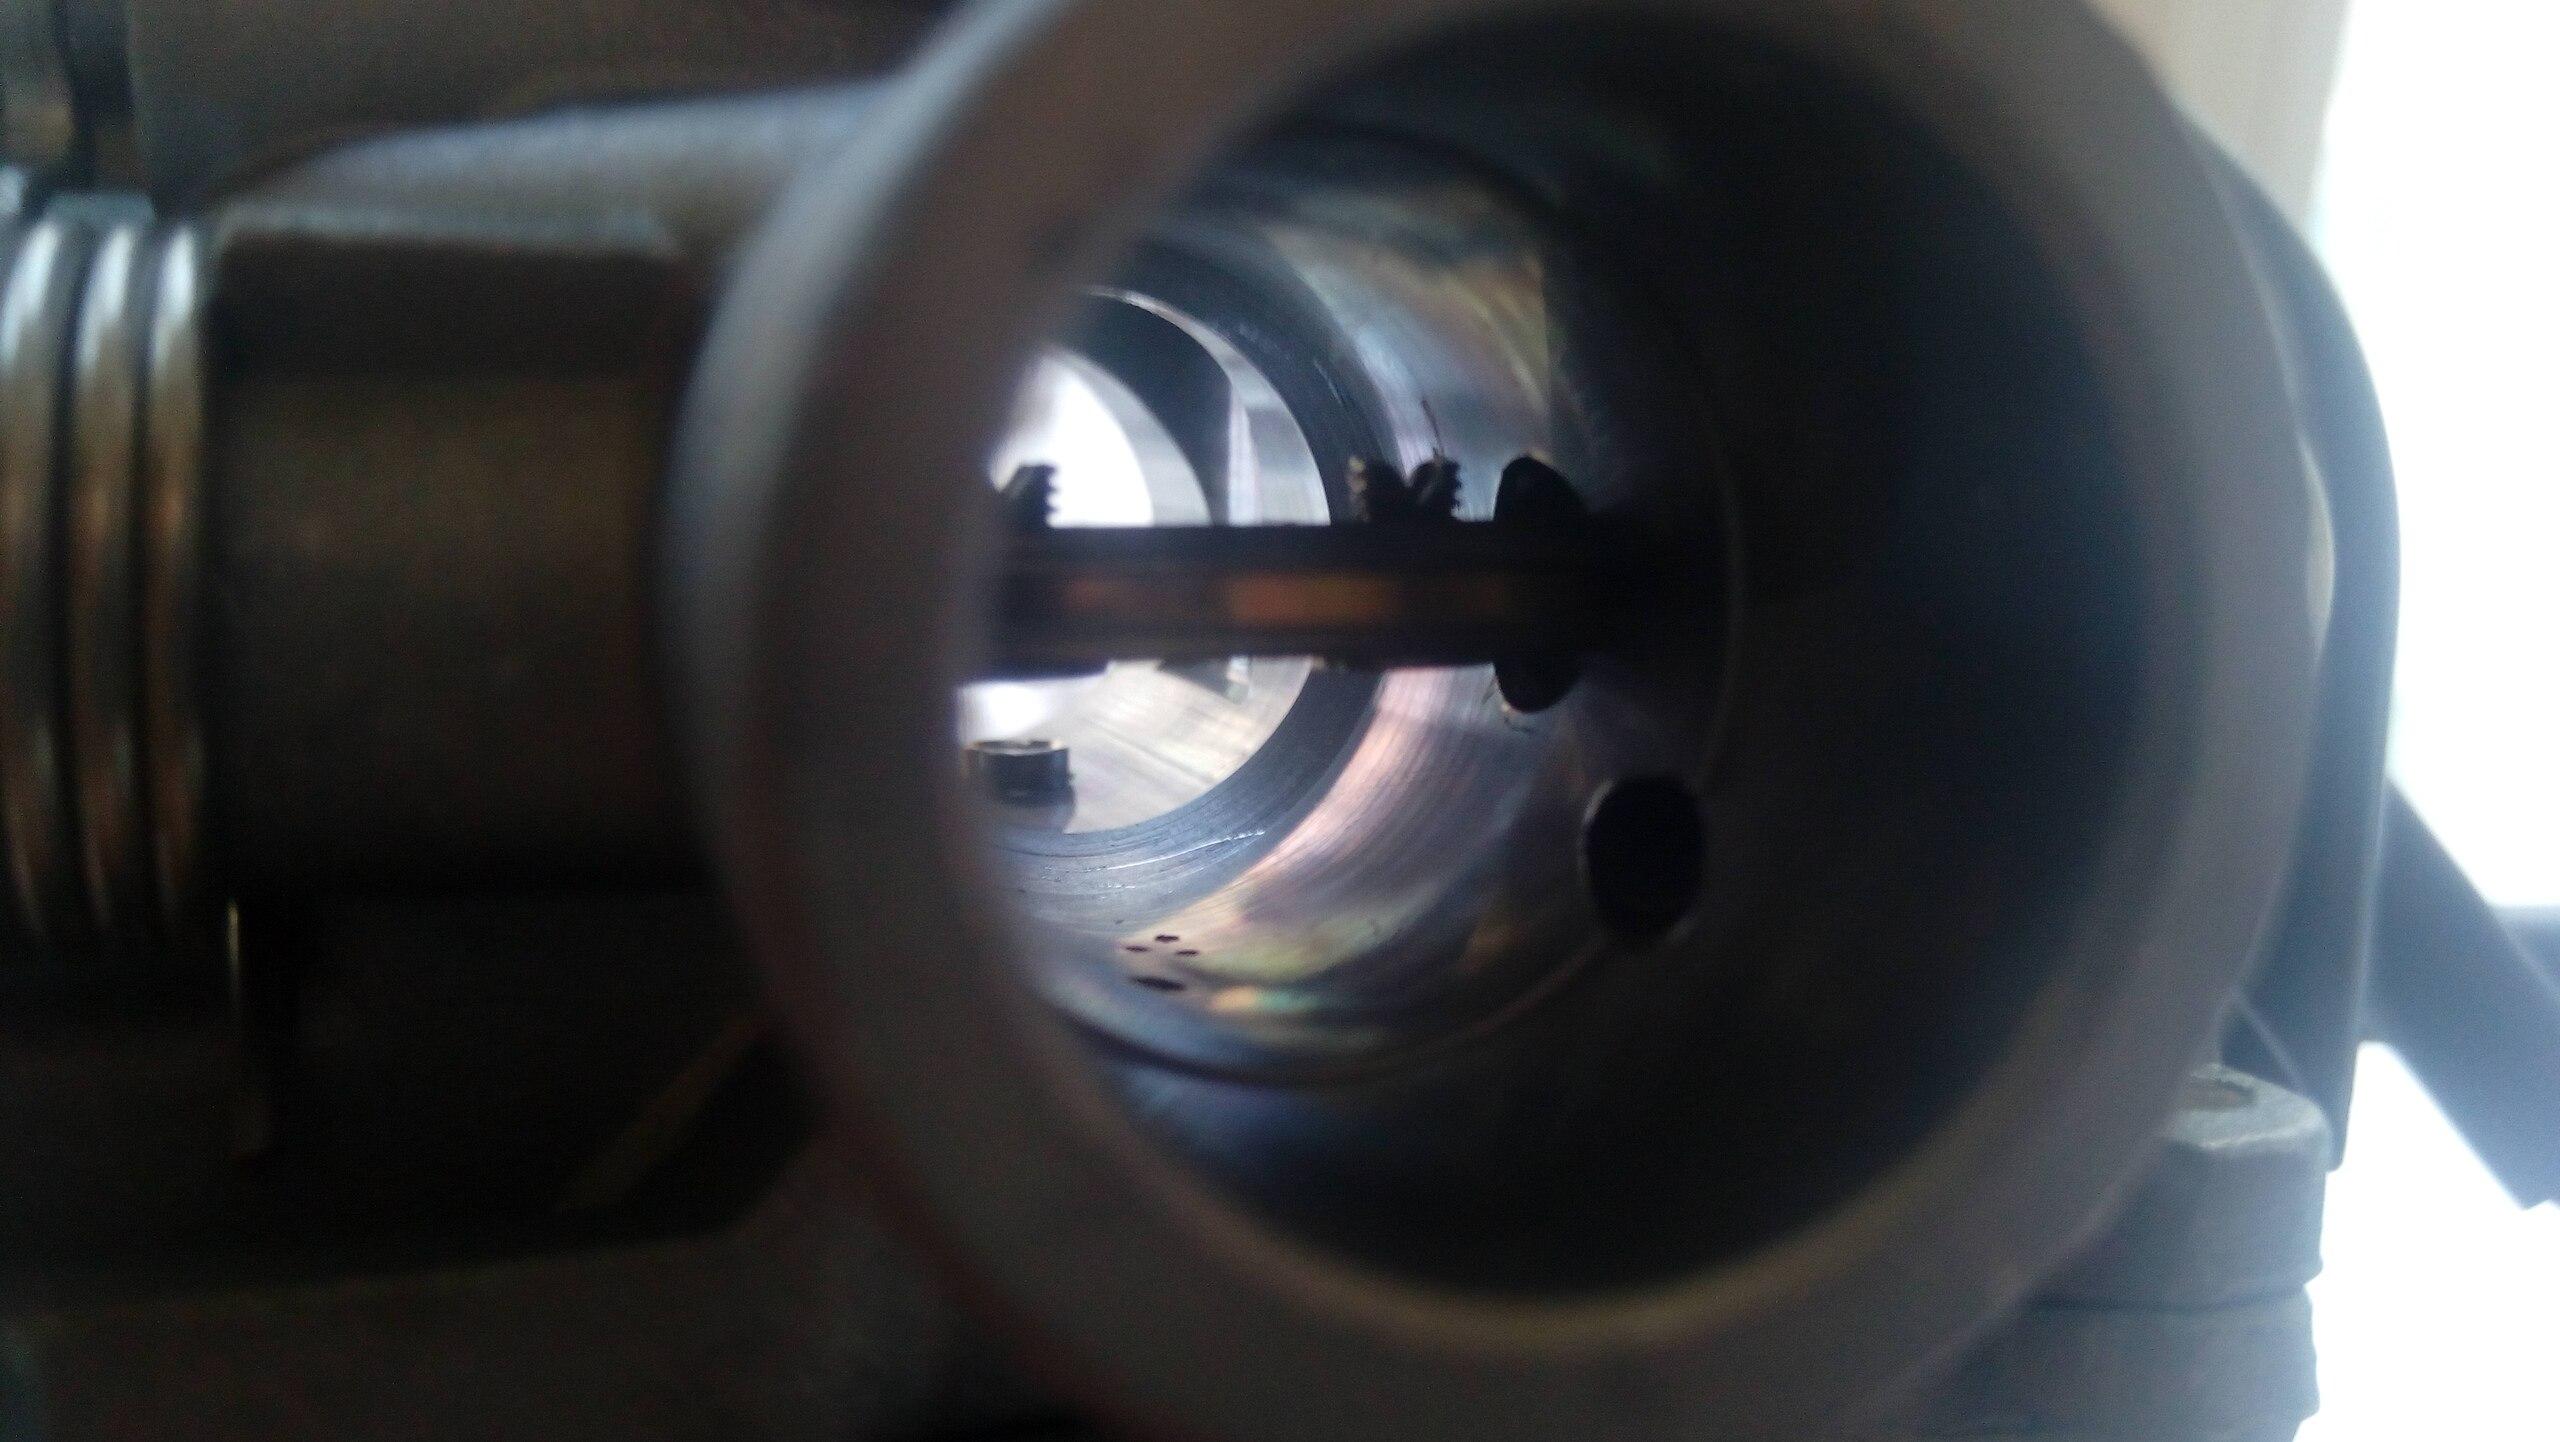 50куб мопед; картинг; Двигатель 50куб ;